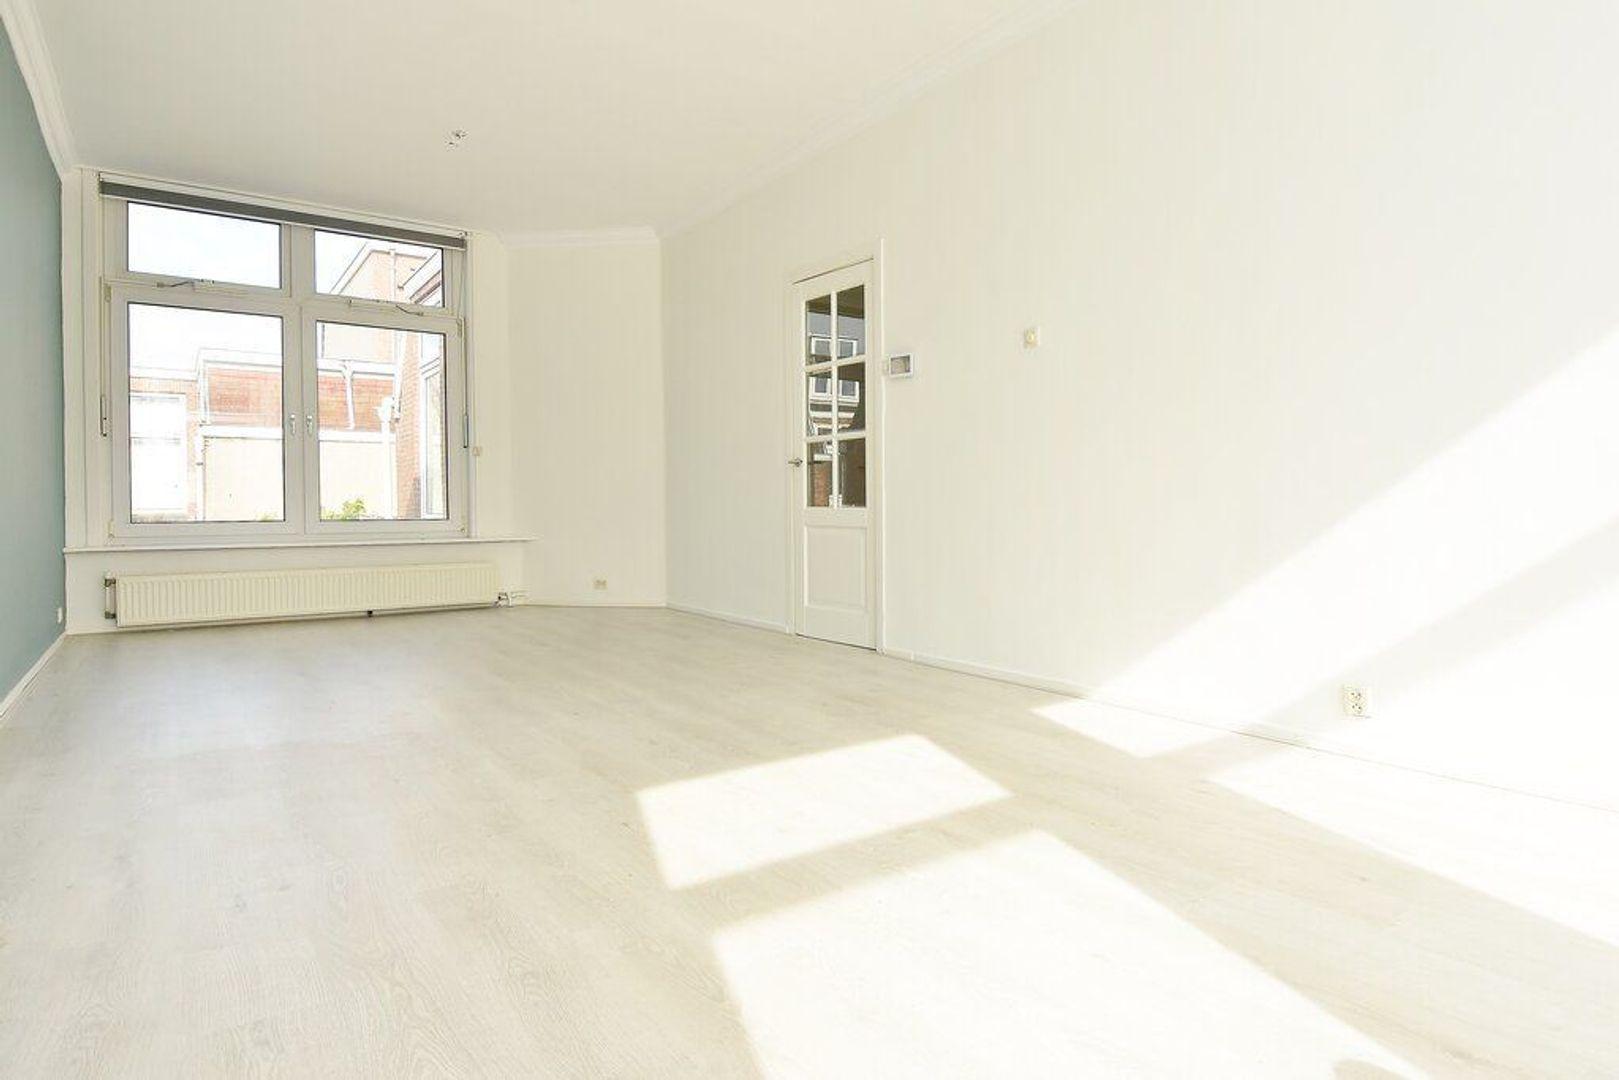 Kenaustraat 12, Den Haag foto-8 blur